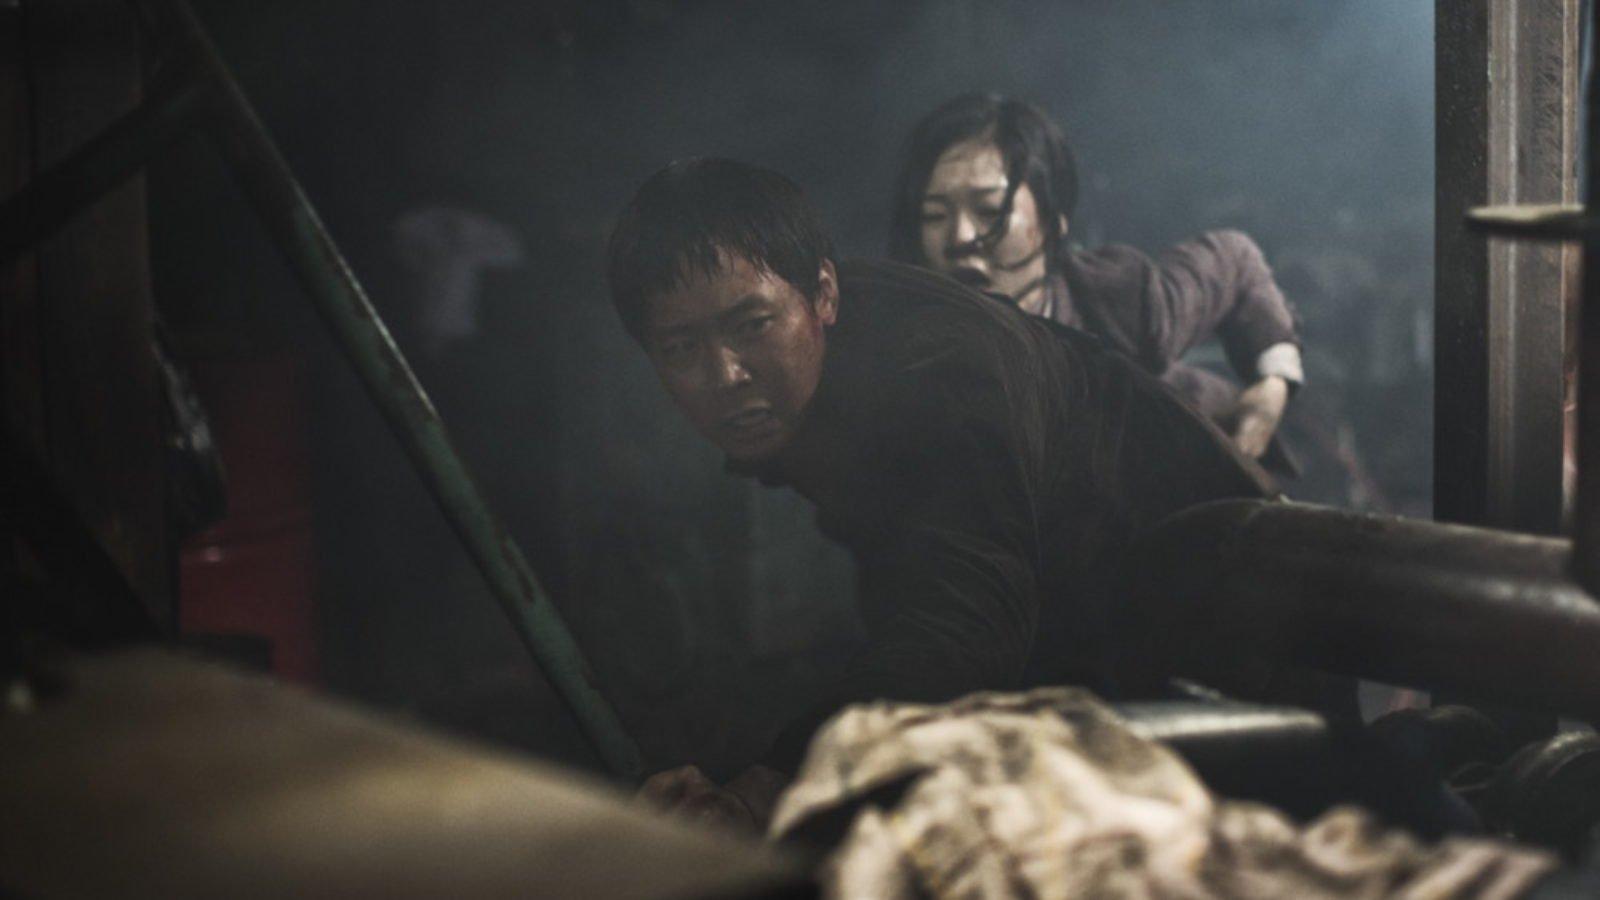 Top Ten Tiff 2014 Films - Haemoo (2014)